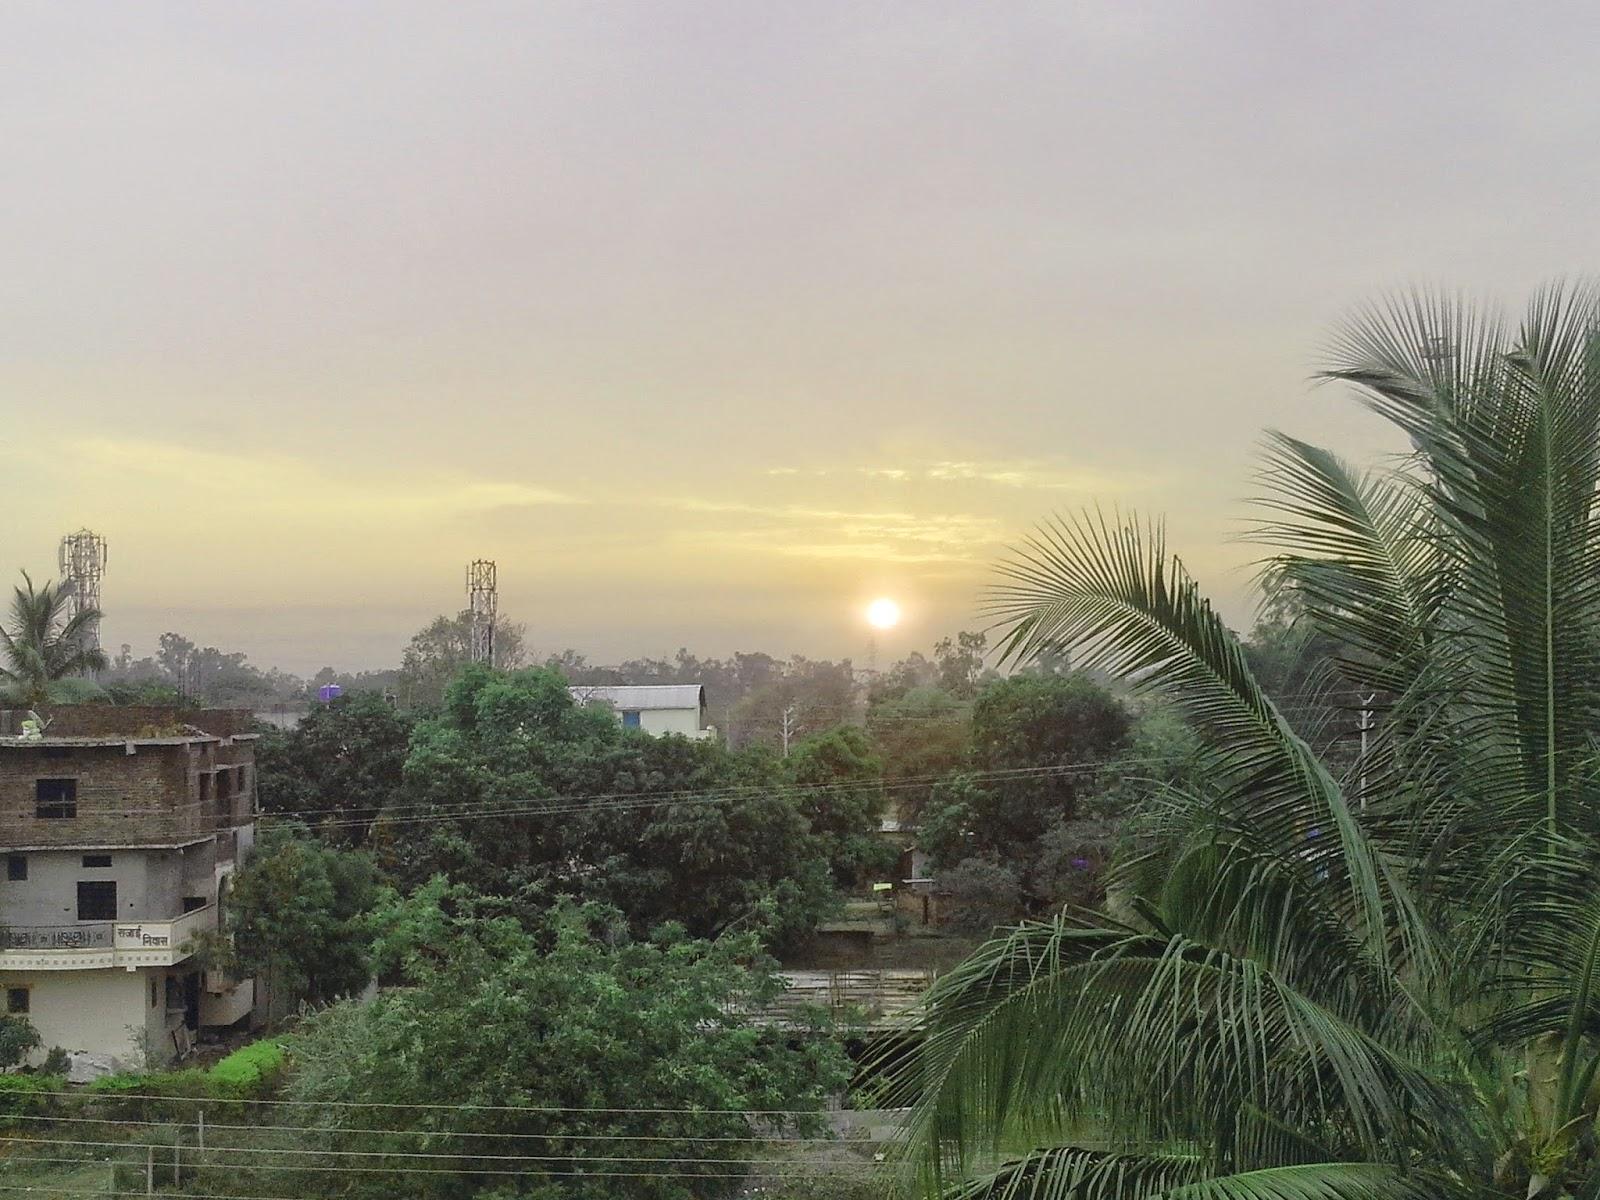 sunrise at nanded near sggsie&t collage vishnupuri nanded